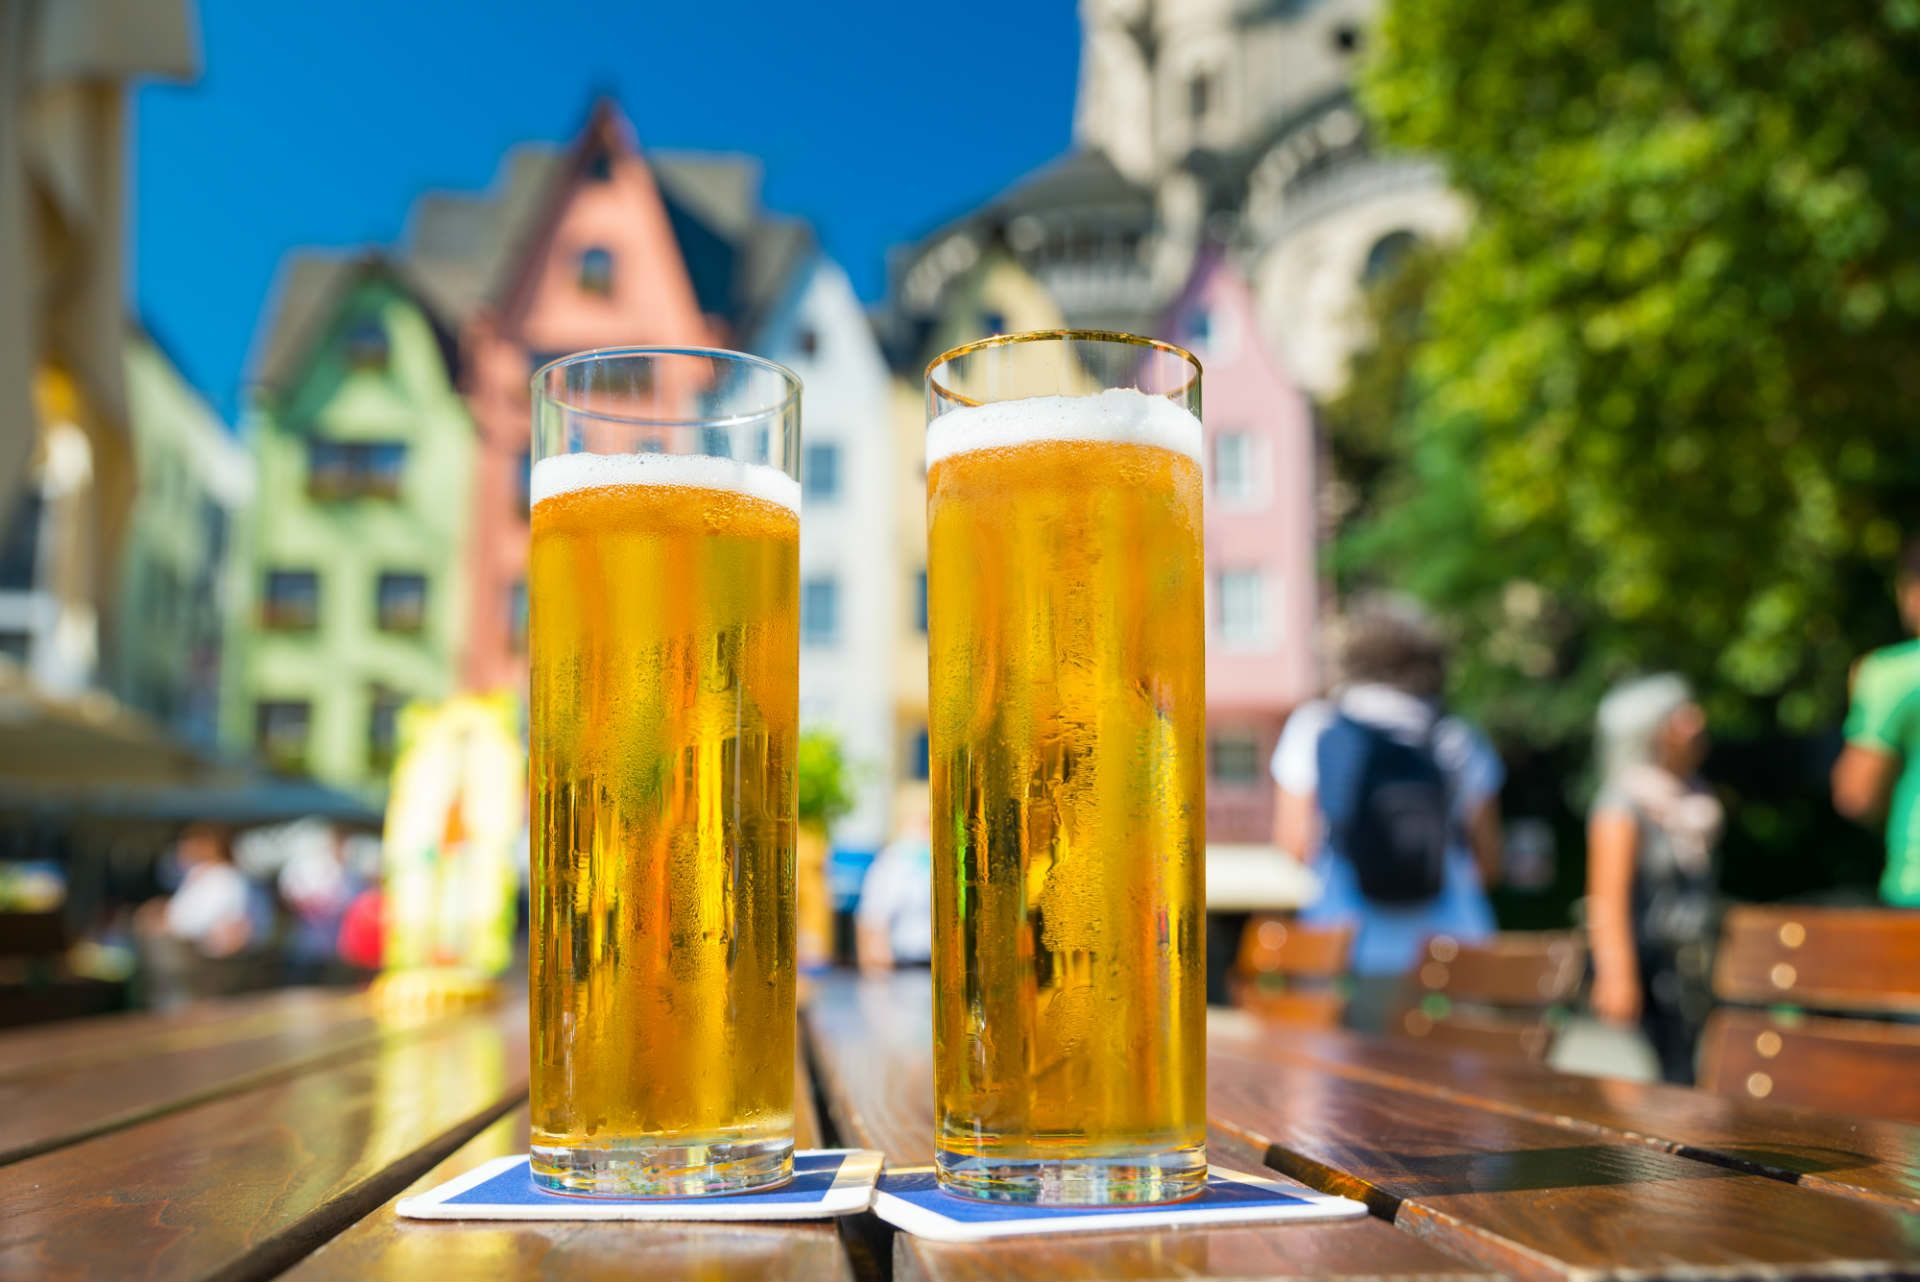 beer-kolsch-cologne-germany-shutterstock_1031548933